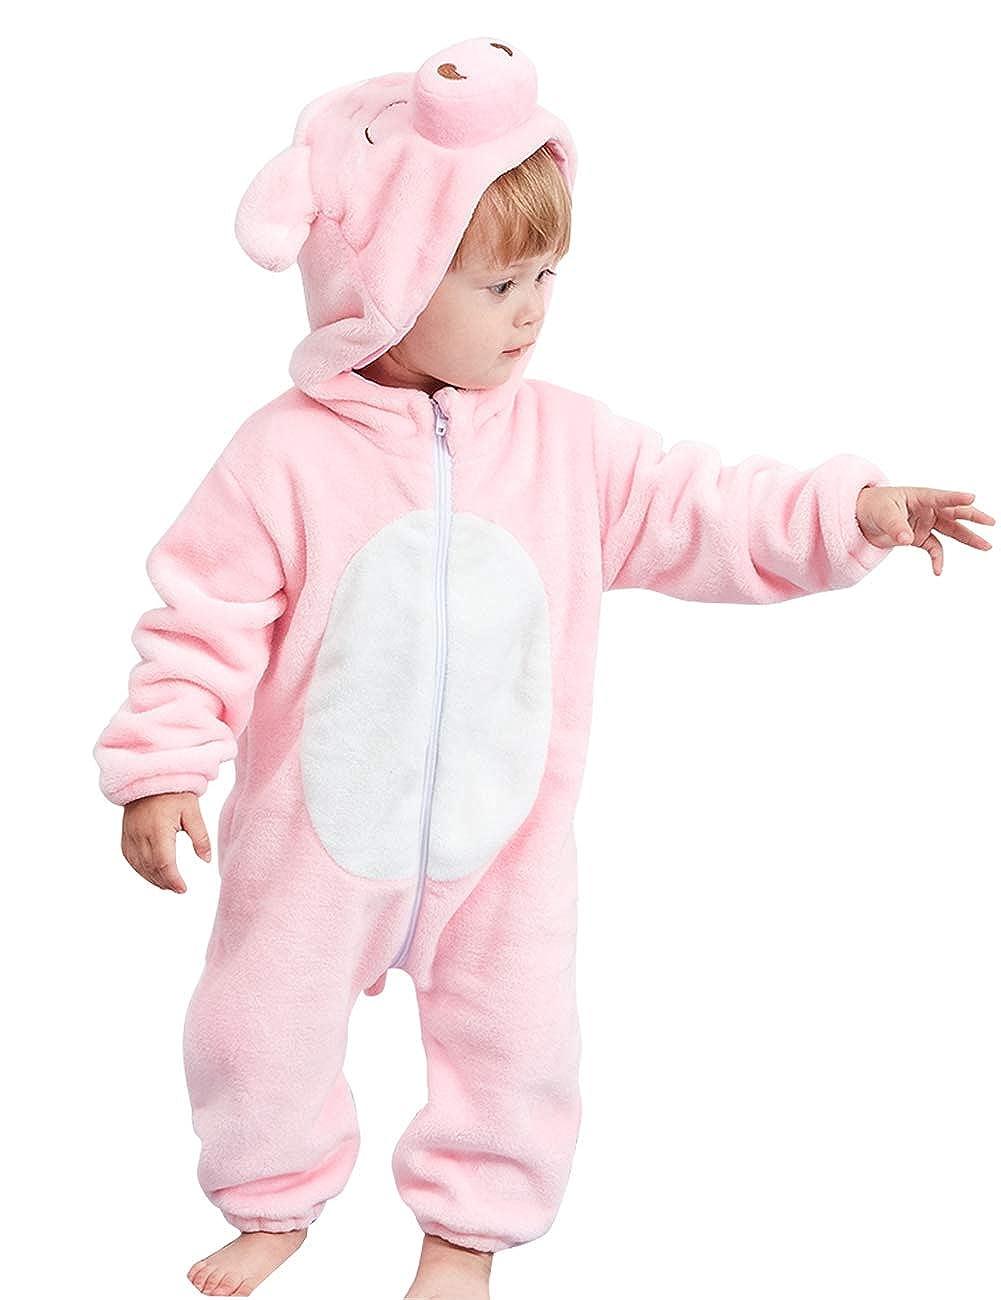 2-24 Meses Beb/é Mameluco Traje de Franela Disfraces Ni/ños Mono Pelele Encapuchado Ni/ñas Invierno Infantil Ropa de Una Pieza Pijama Animado Animal Oto/ño Happy Cherry